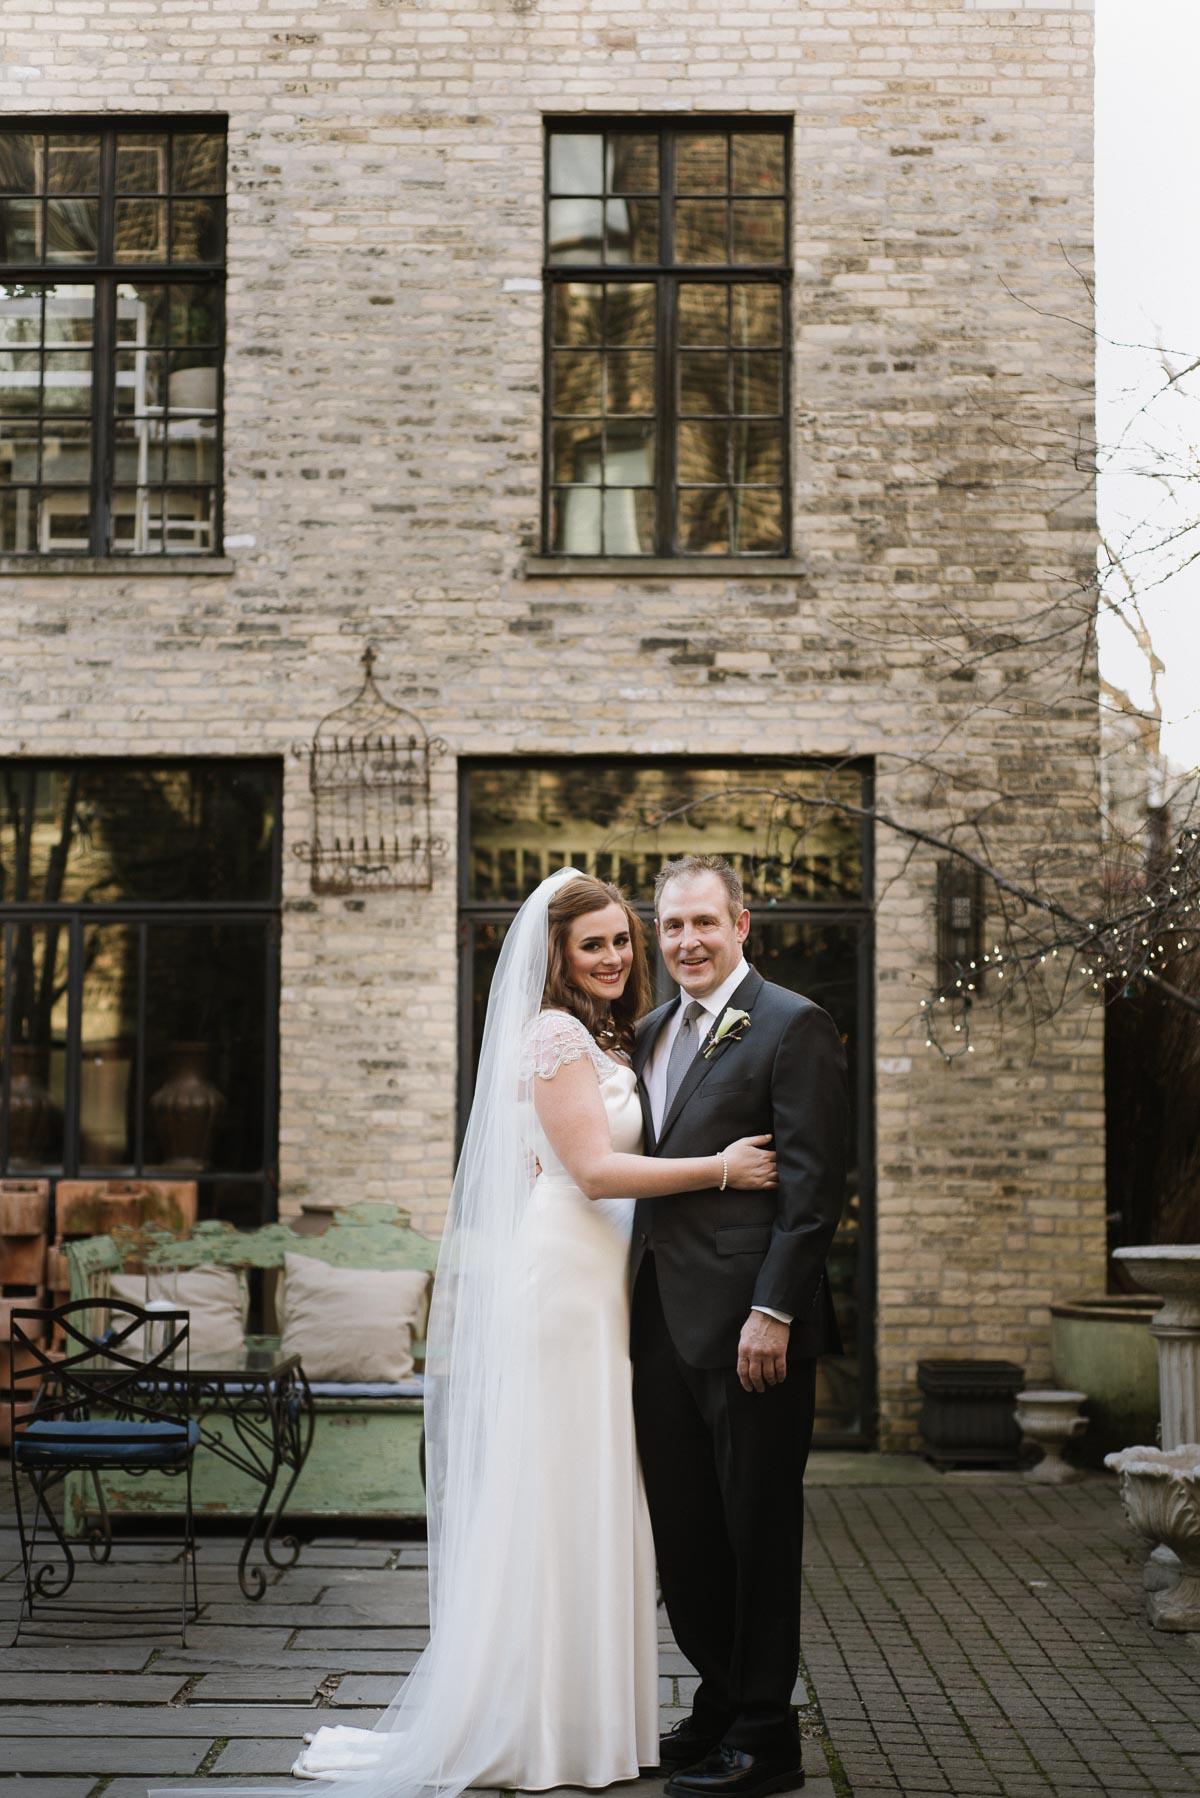 Pamela Yasuko Photography - A New Leaf Wedding - Chicago Oahu Photographer-26.jpg